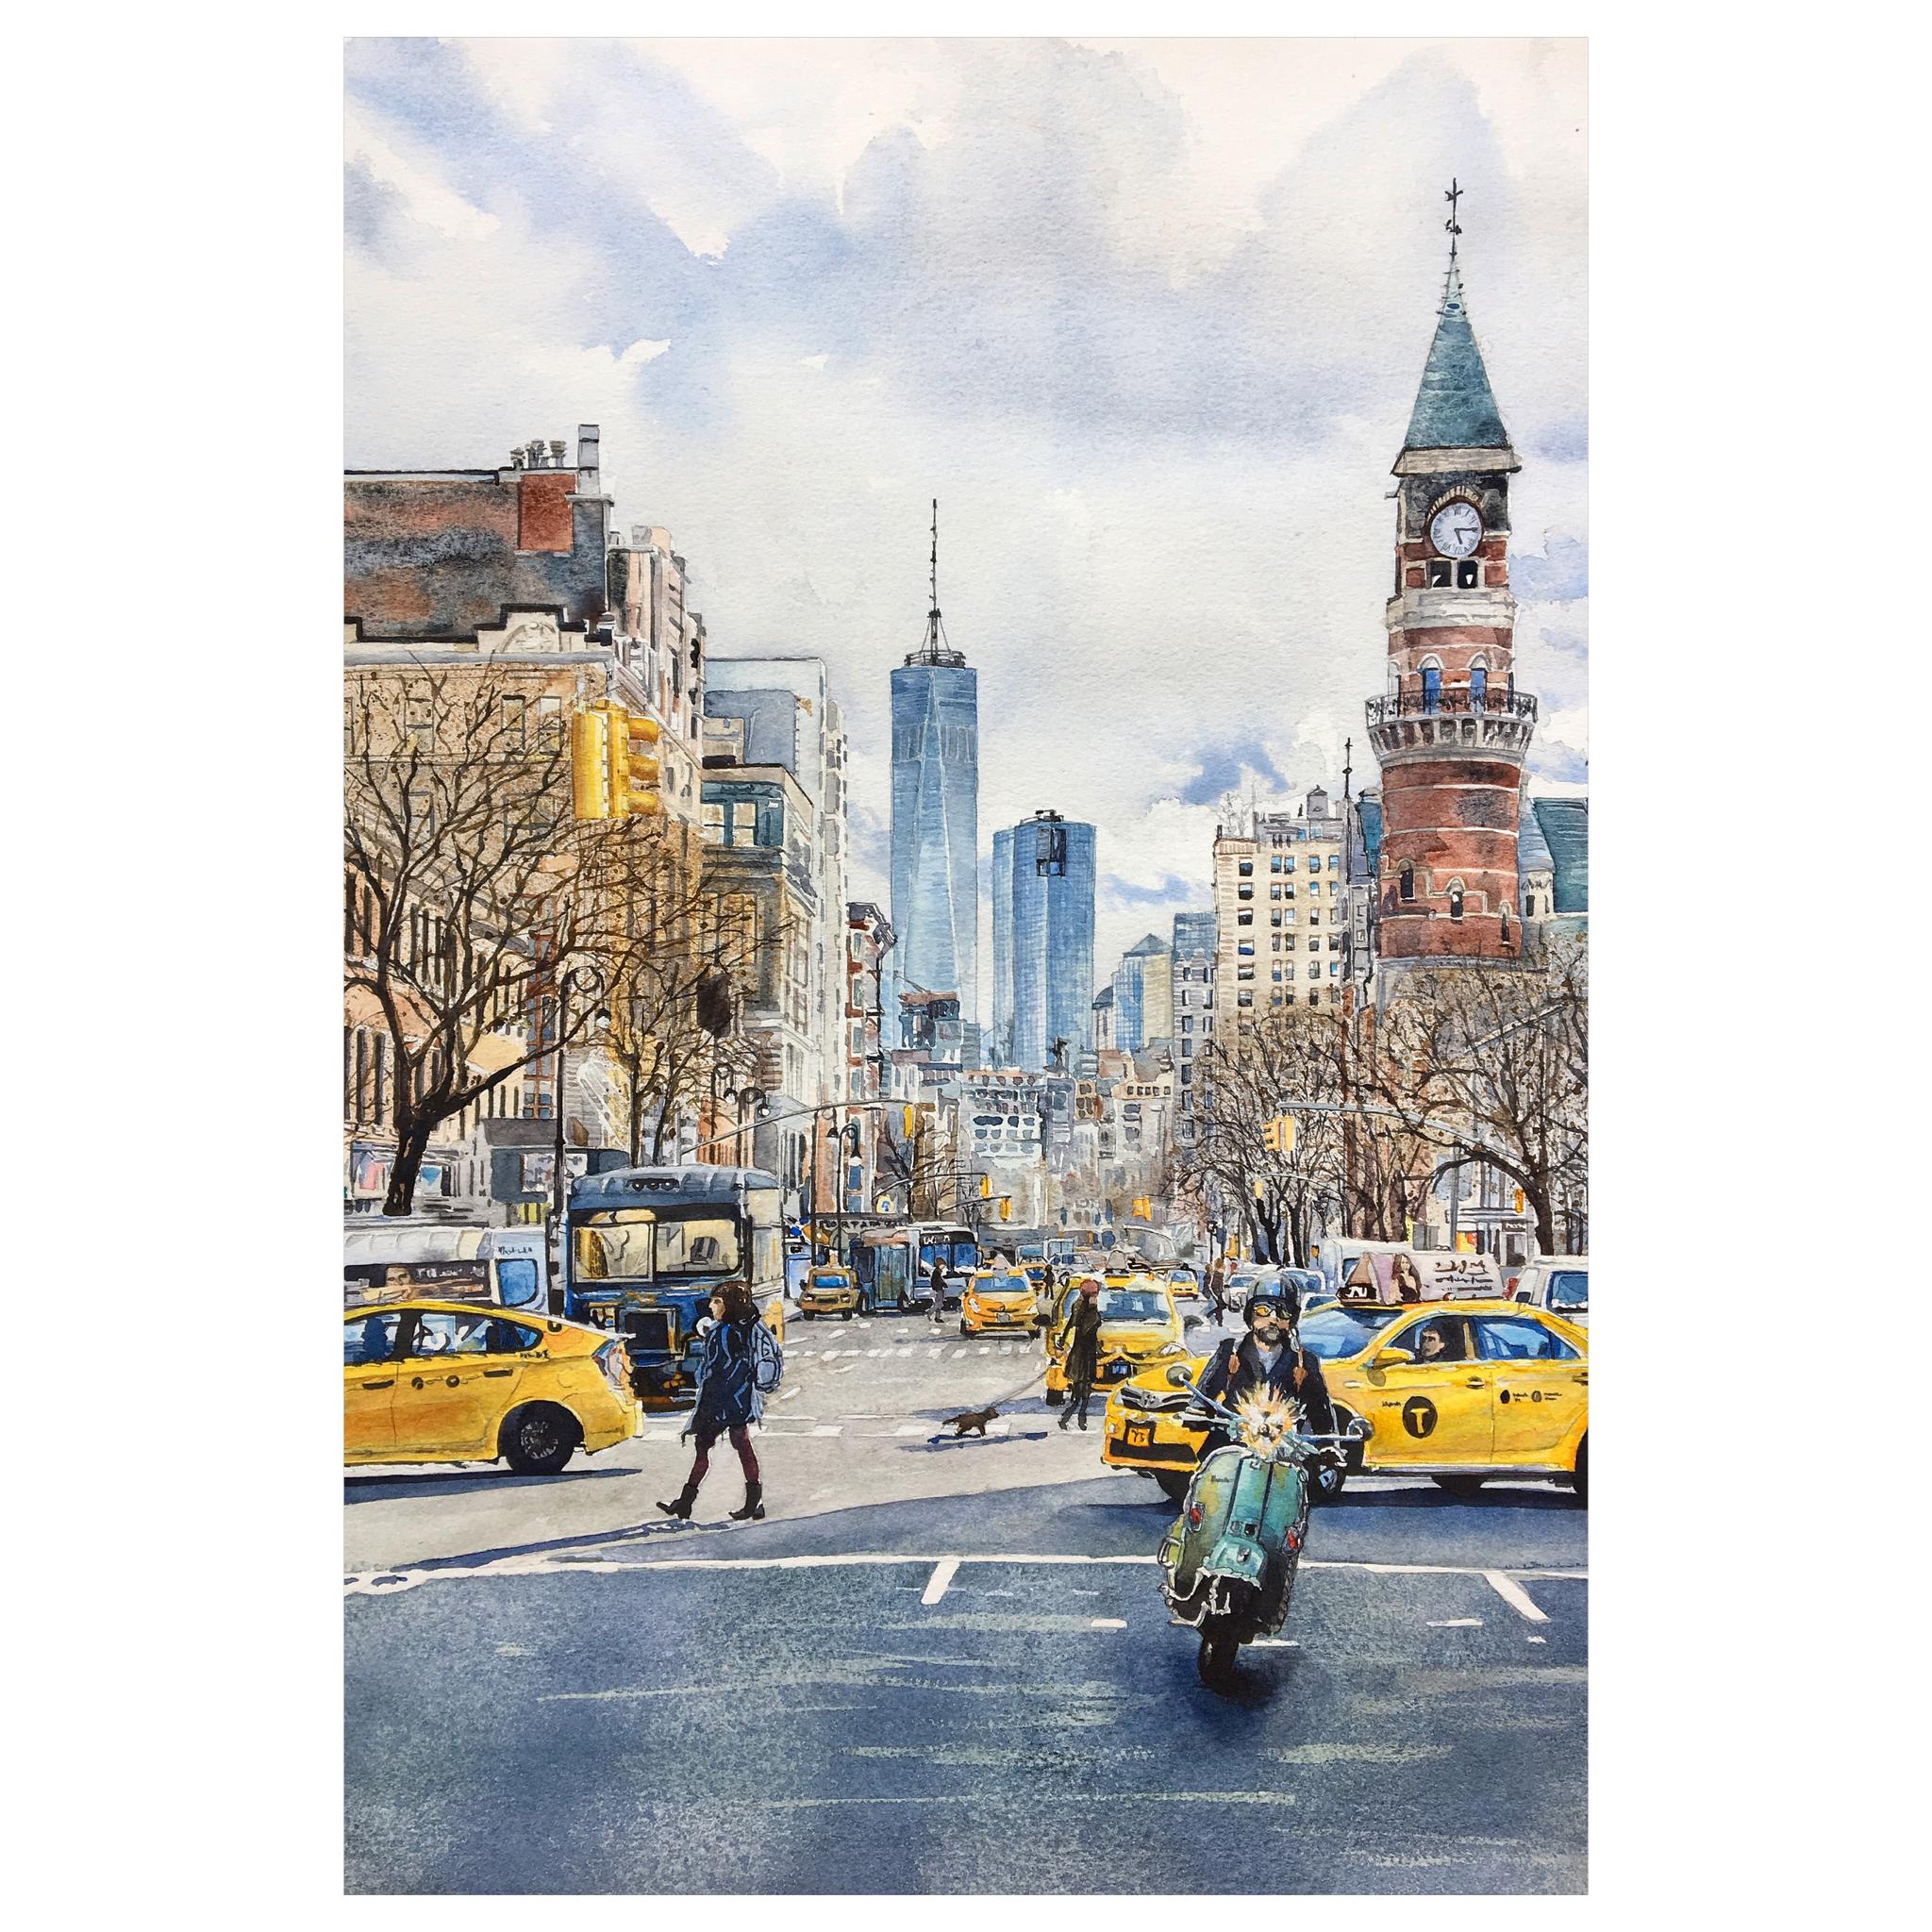 Watercolor New York: New York, Watercolor By Catarina Alkemark